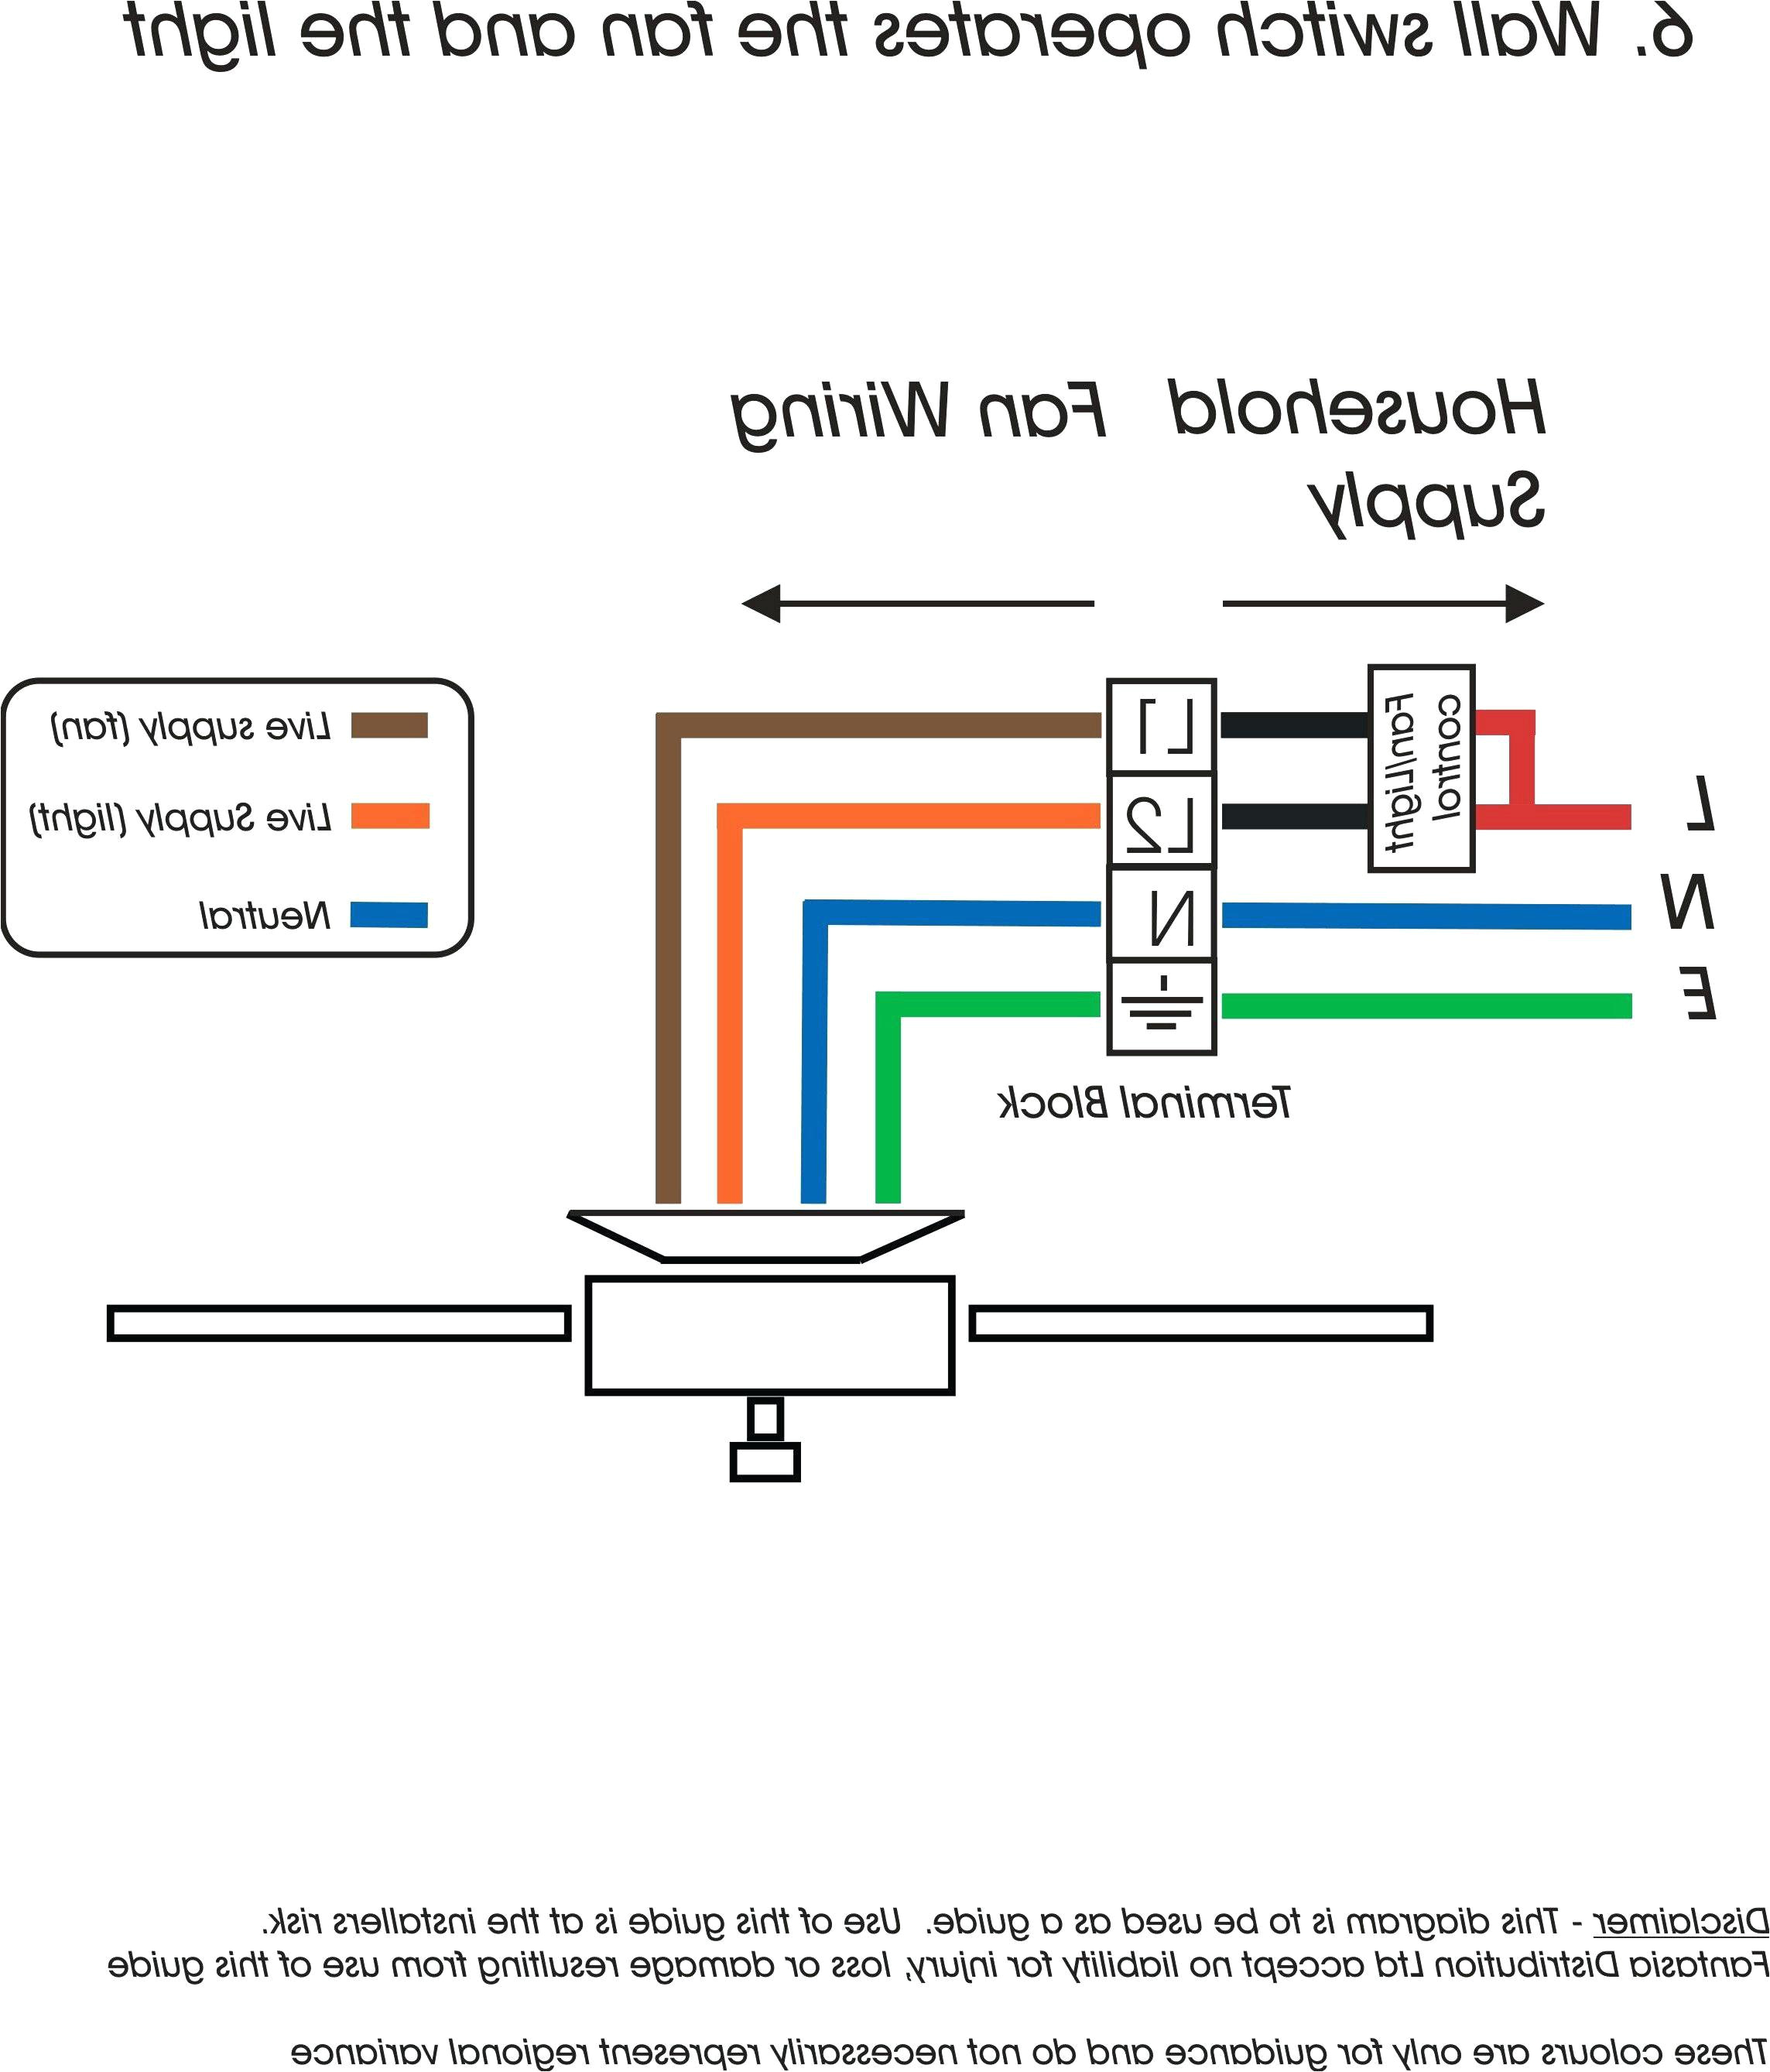 audi a4 stereo wiring diagram luxury audi a4 radio wiring diagram valid audi a4 b6 radio wiring diagram jpg